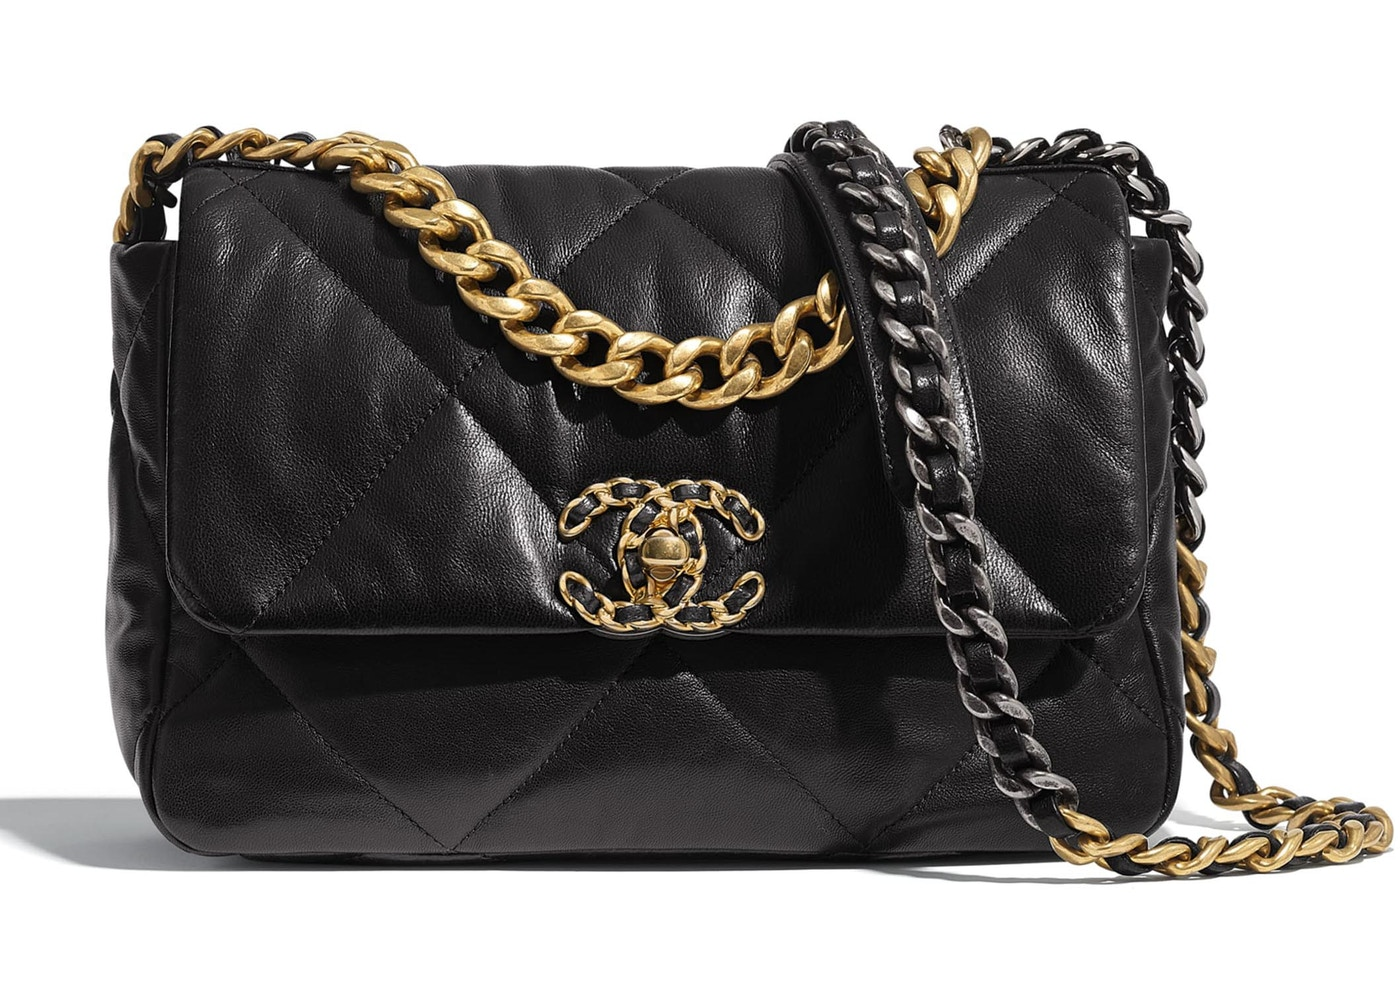 Chanel 19 Flap Bag Lambskin Gold